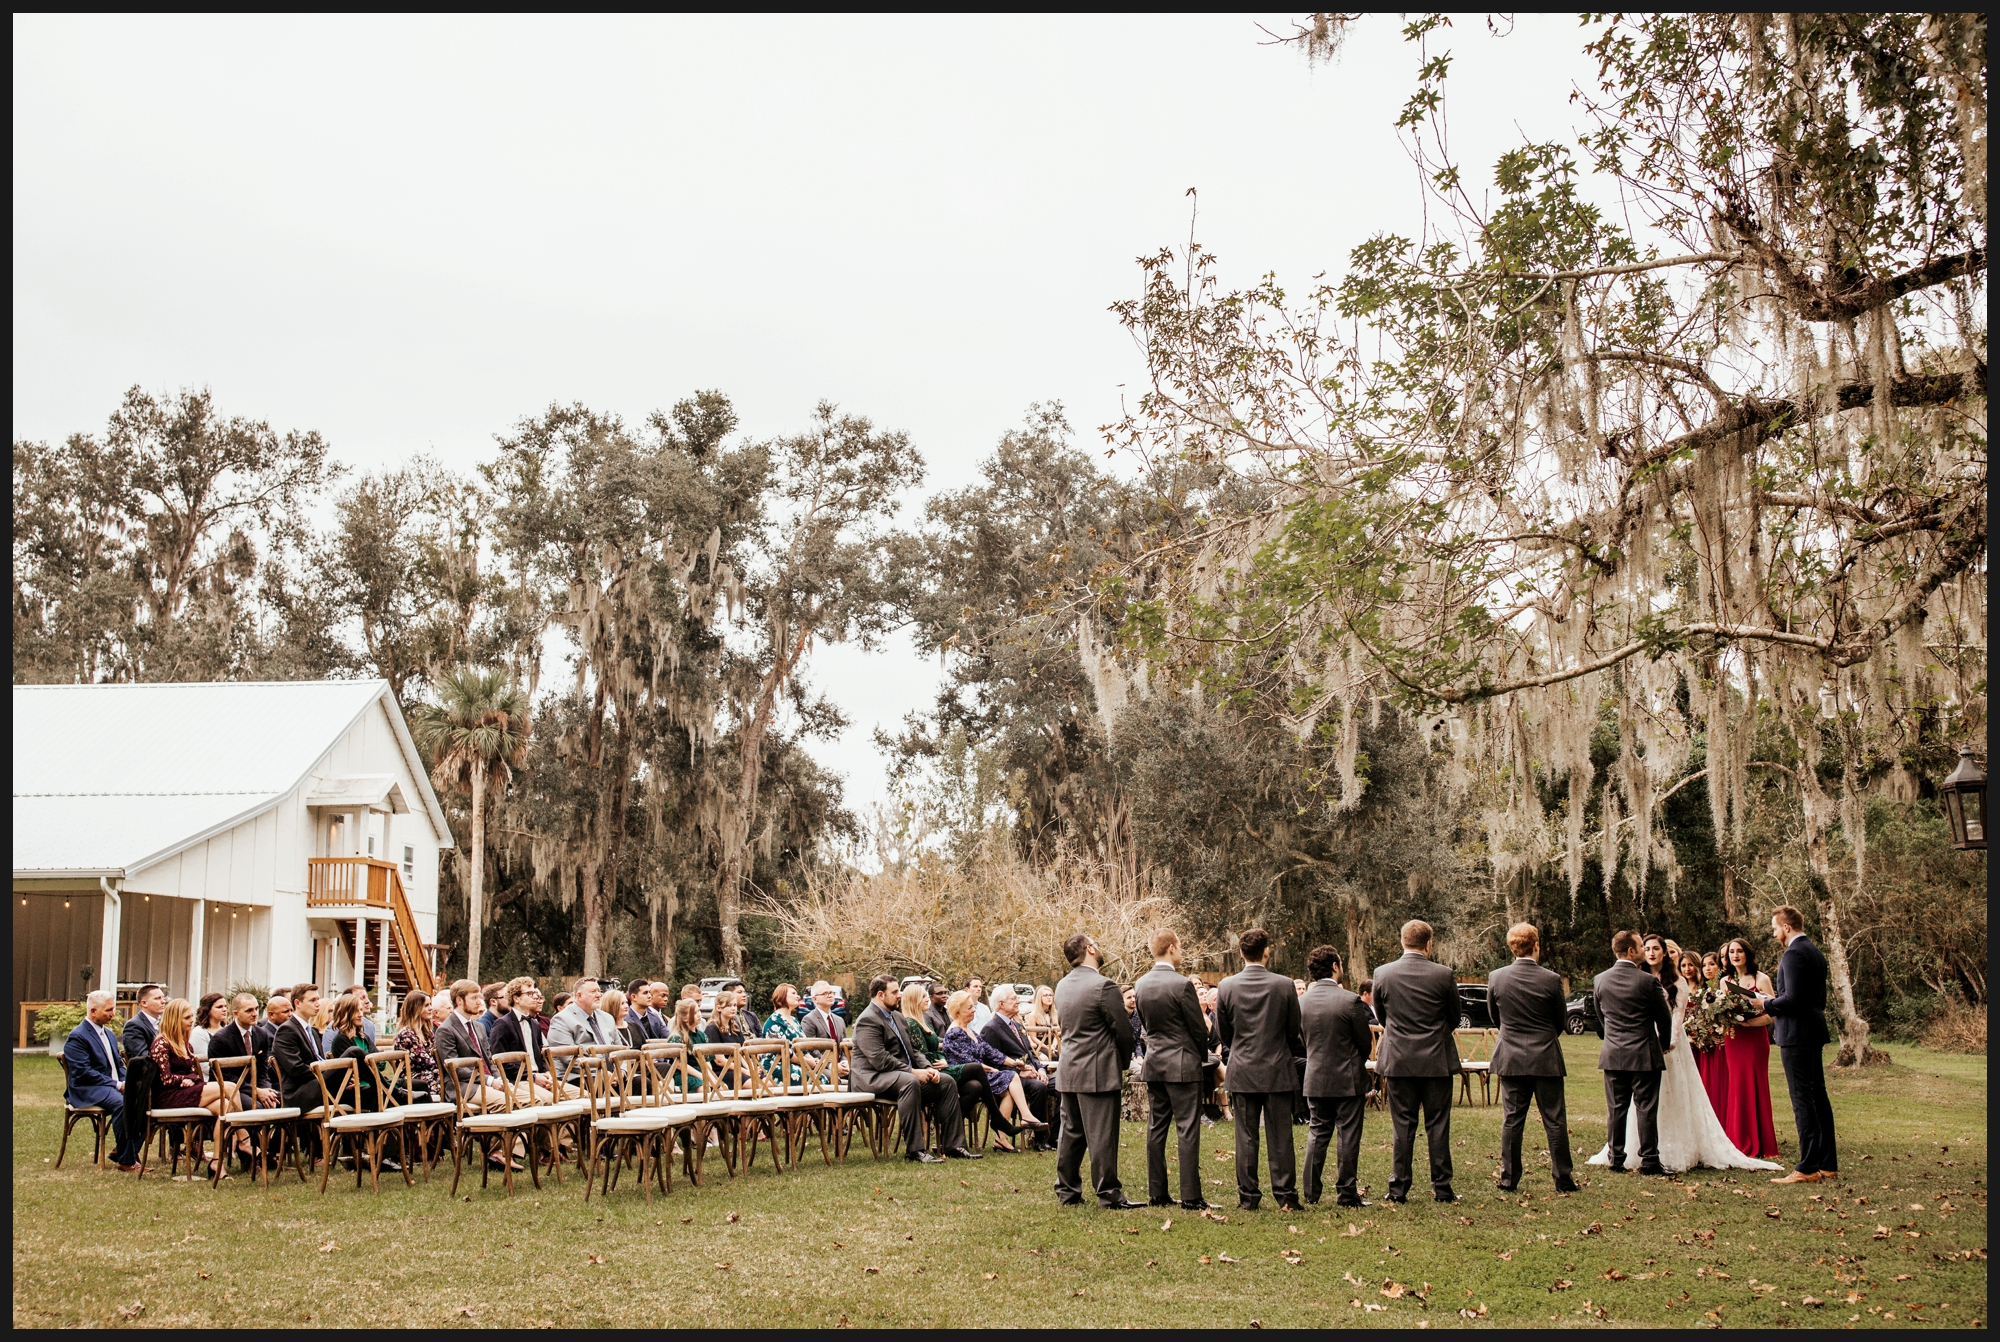 Orlando-Wedding-Photographer-destination-wedding-photographer-florida-wedding-photographer-hawaii-wedding-photographer_0526.jpg